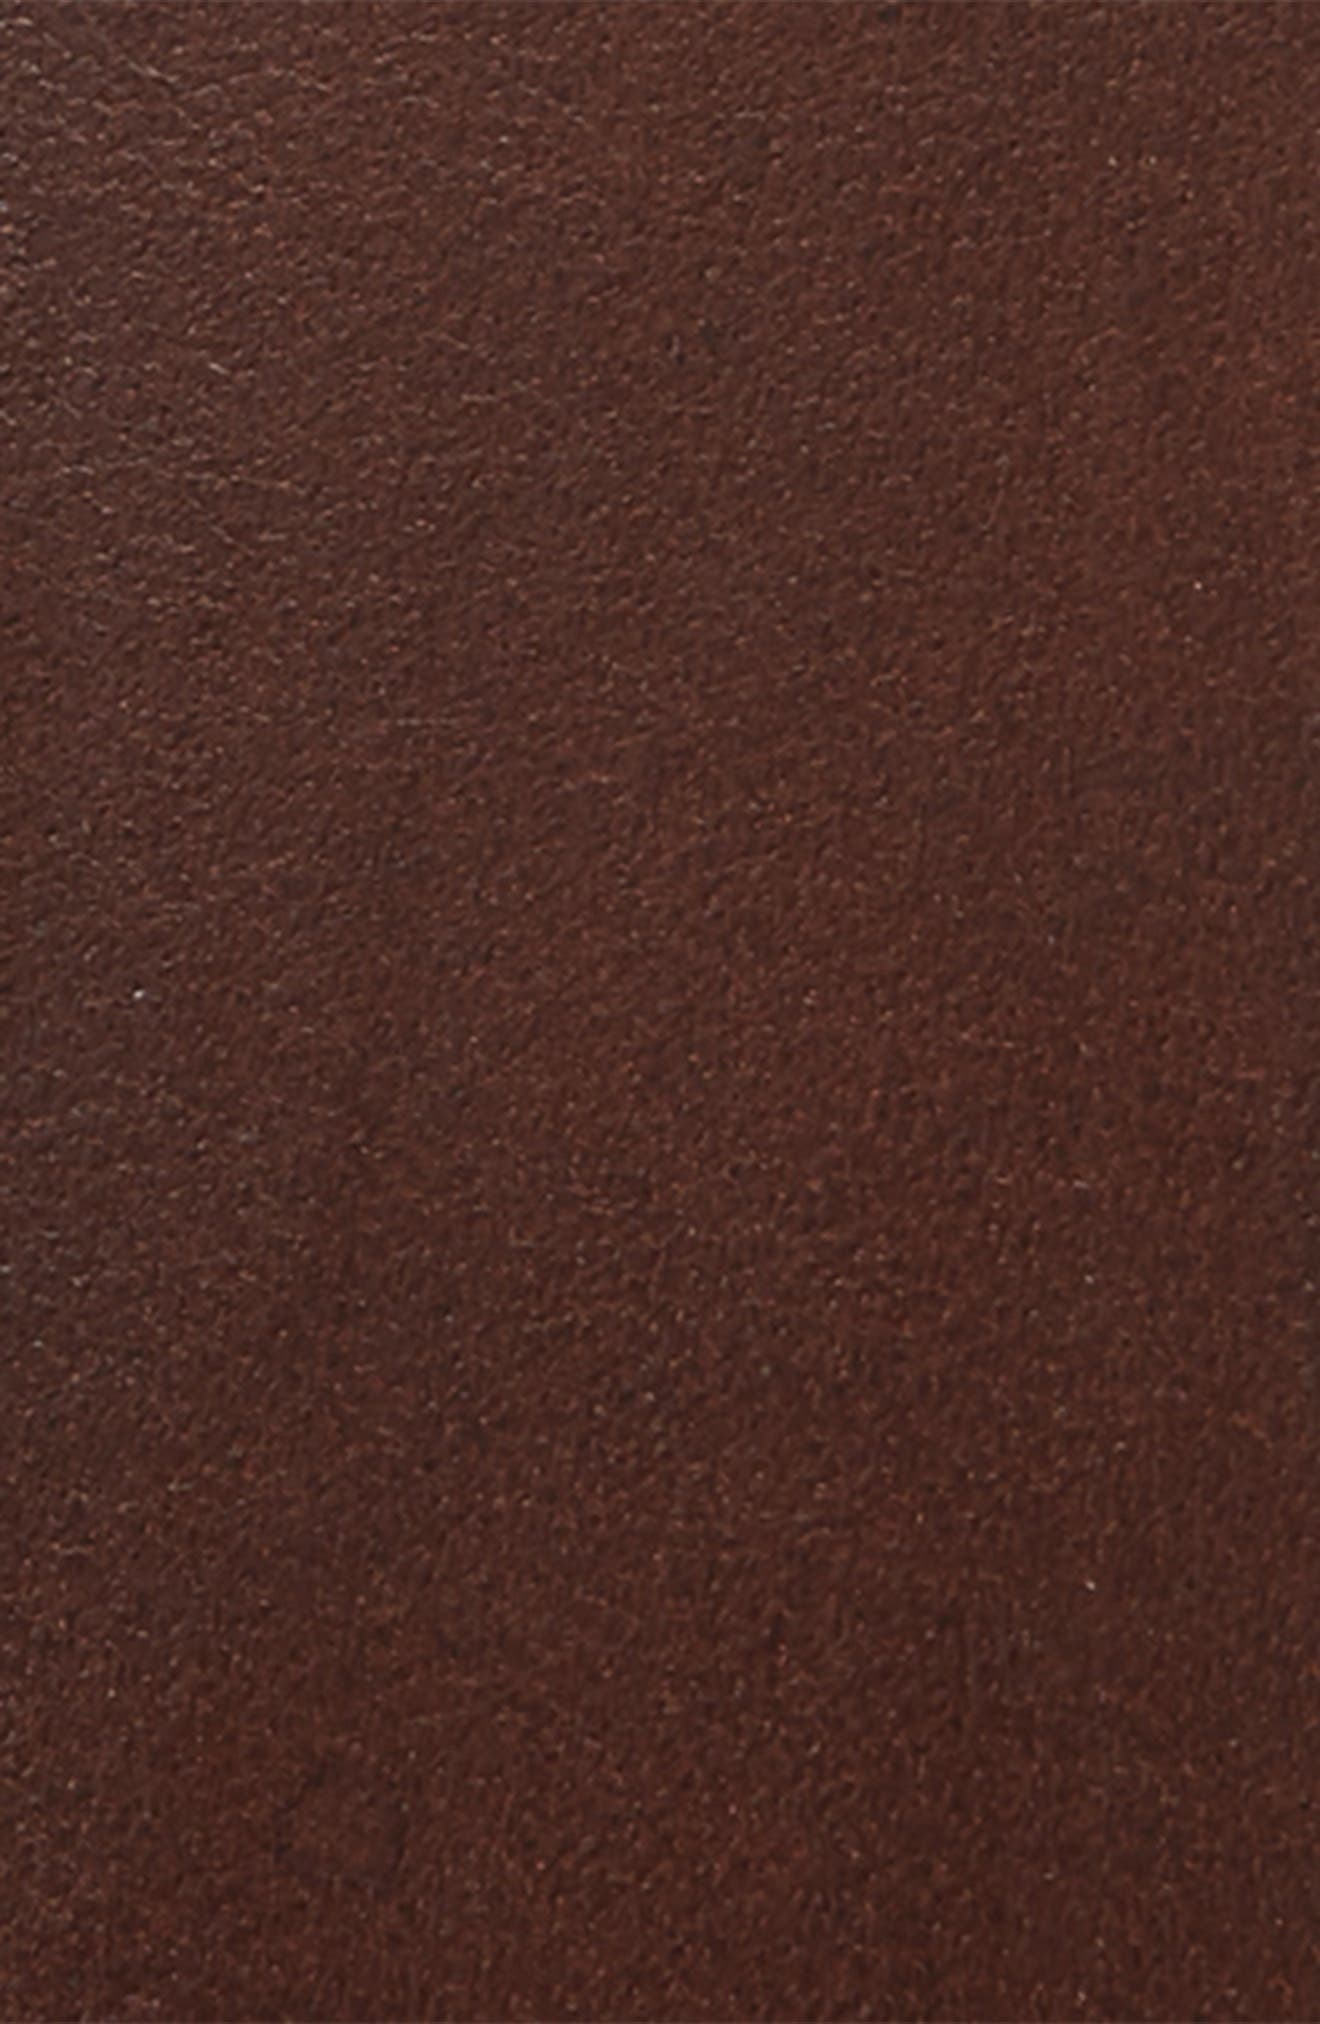 Classic Leather Belt,                             Alternate thumbnail 2, color,                             COGNAC/ BRUSHED STEEL